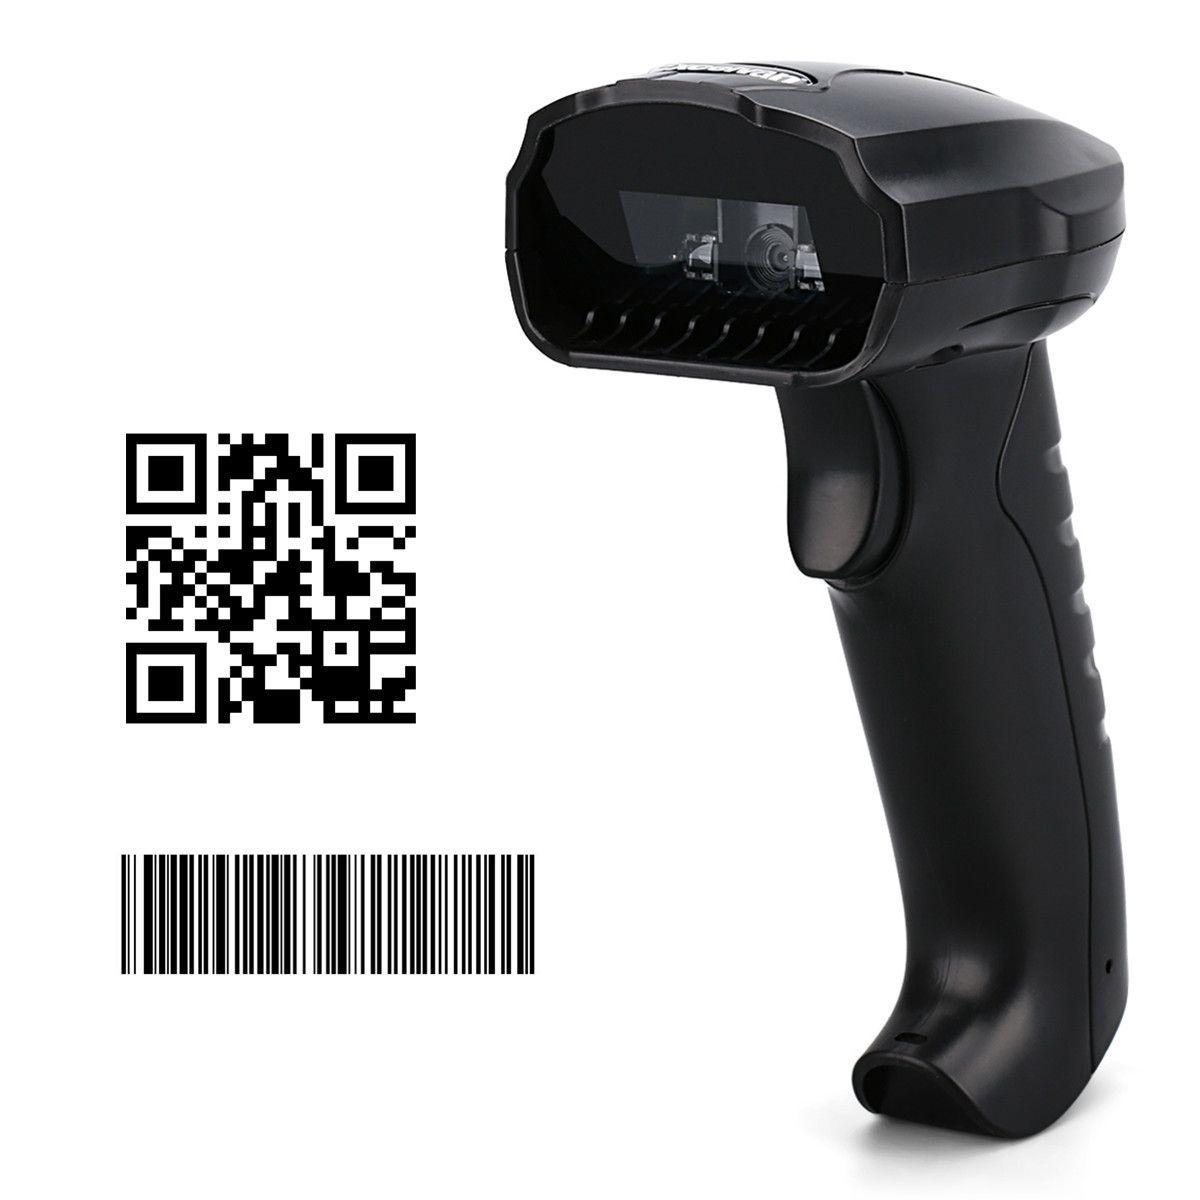 Excelvan 1D 2D QR Code Image Barcode Scanner - Black Price